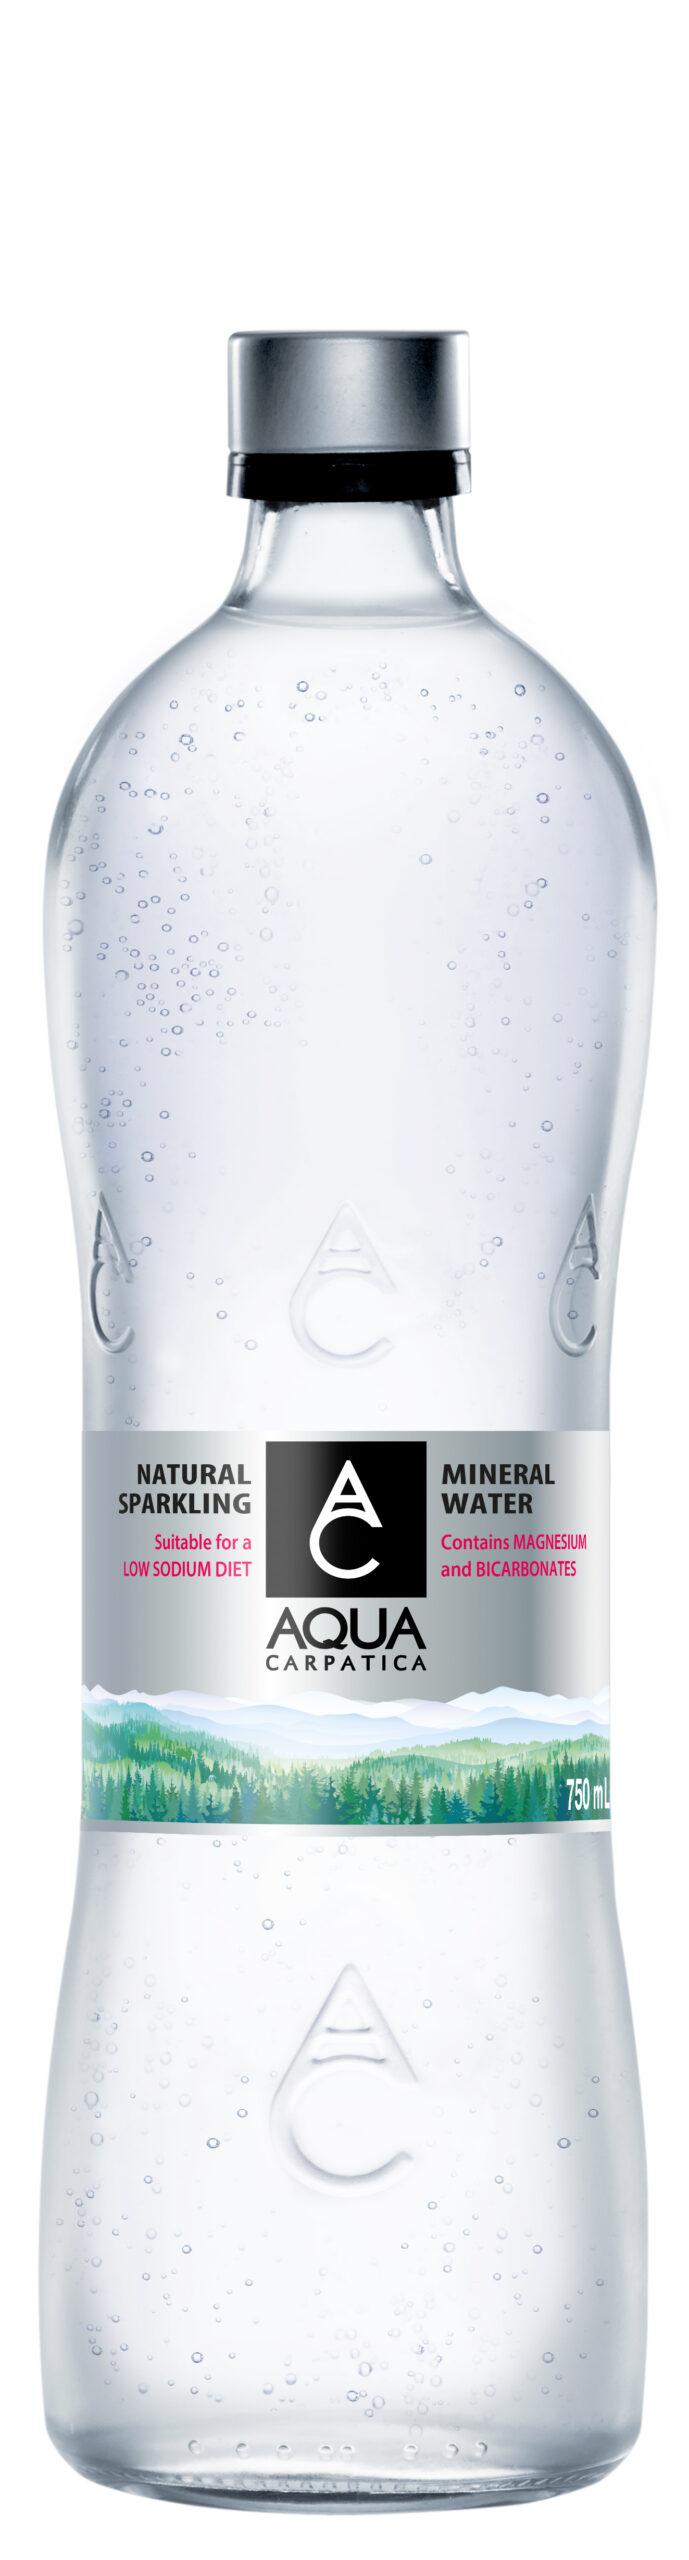 fles agua carpatia bruiswater